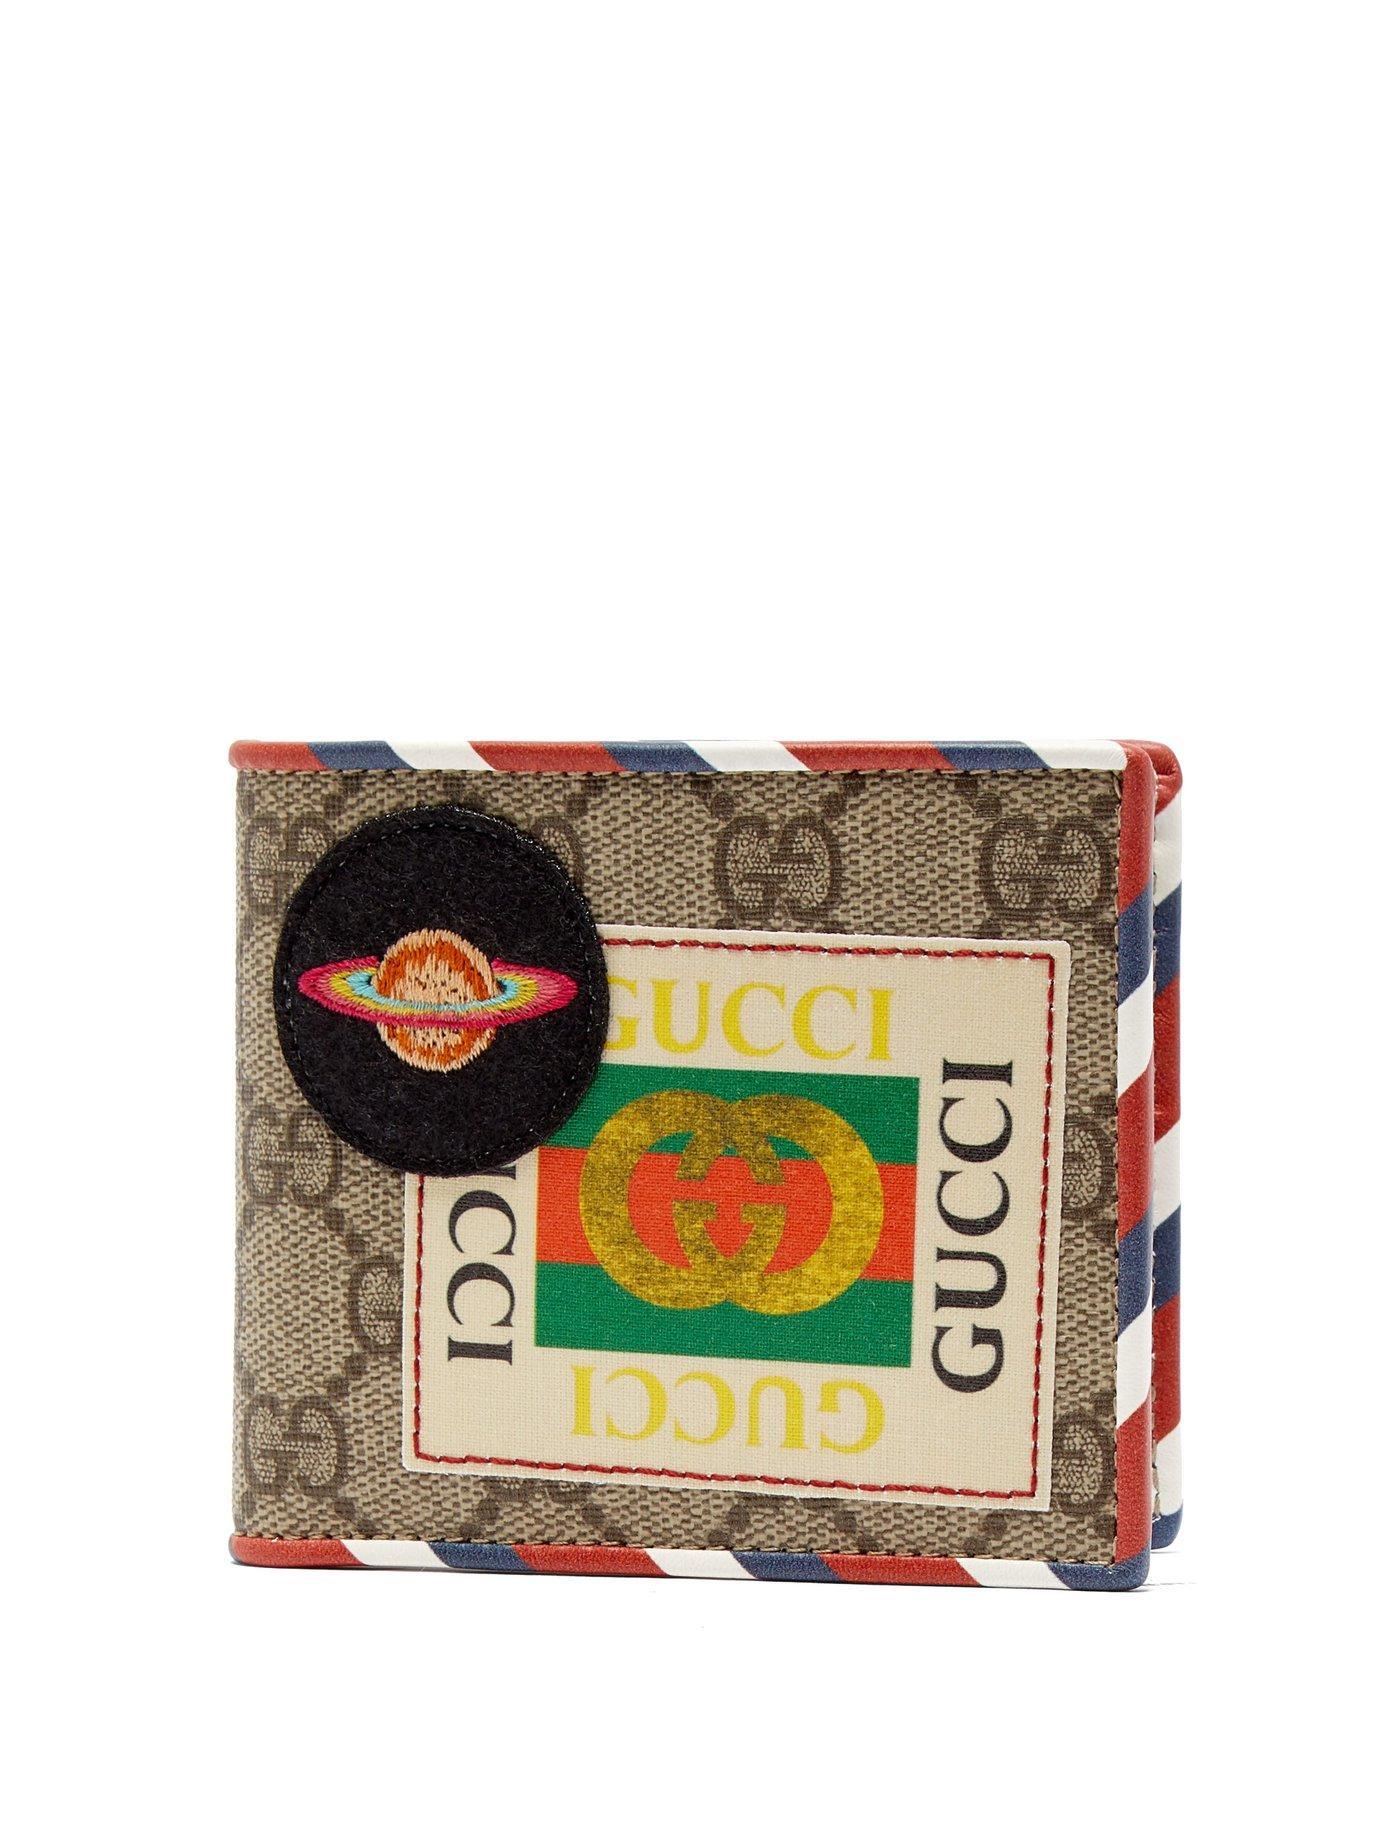 268756e687ad Gucci Beige Courrier Gg Supreme Canvas Wallet - Farfetch In 8899 Beige